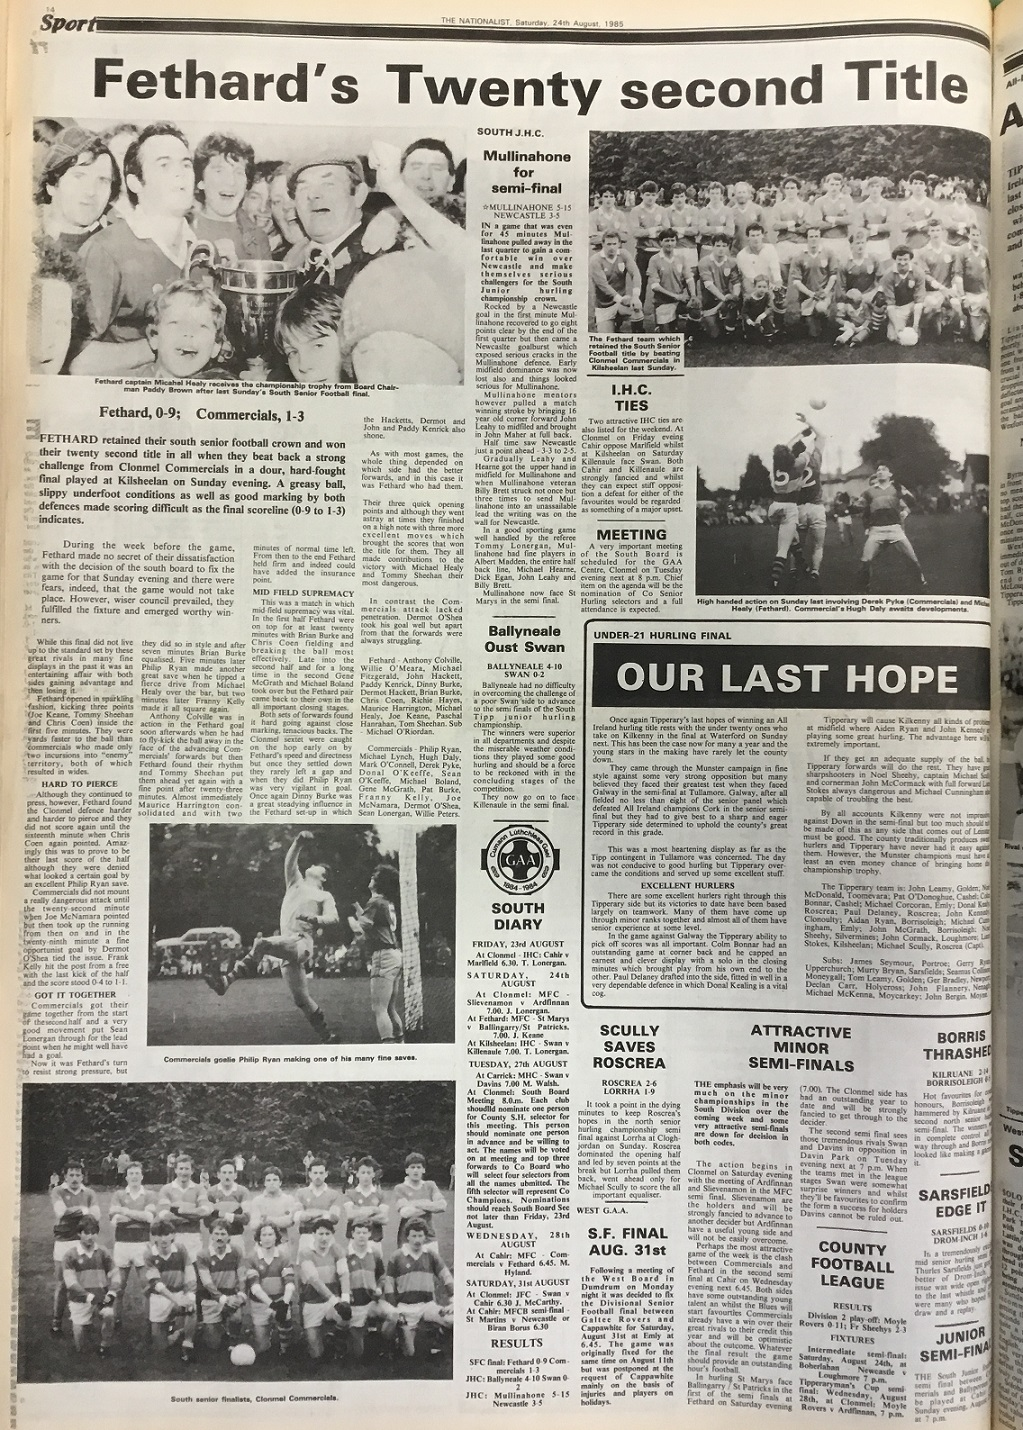 1985 South football final (2)